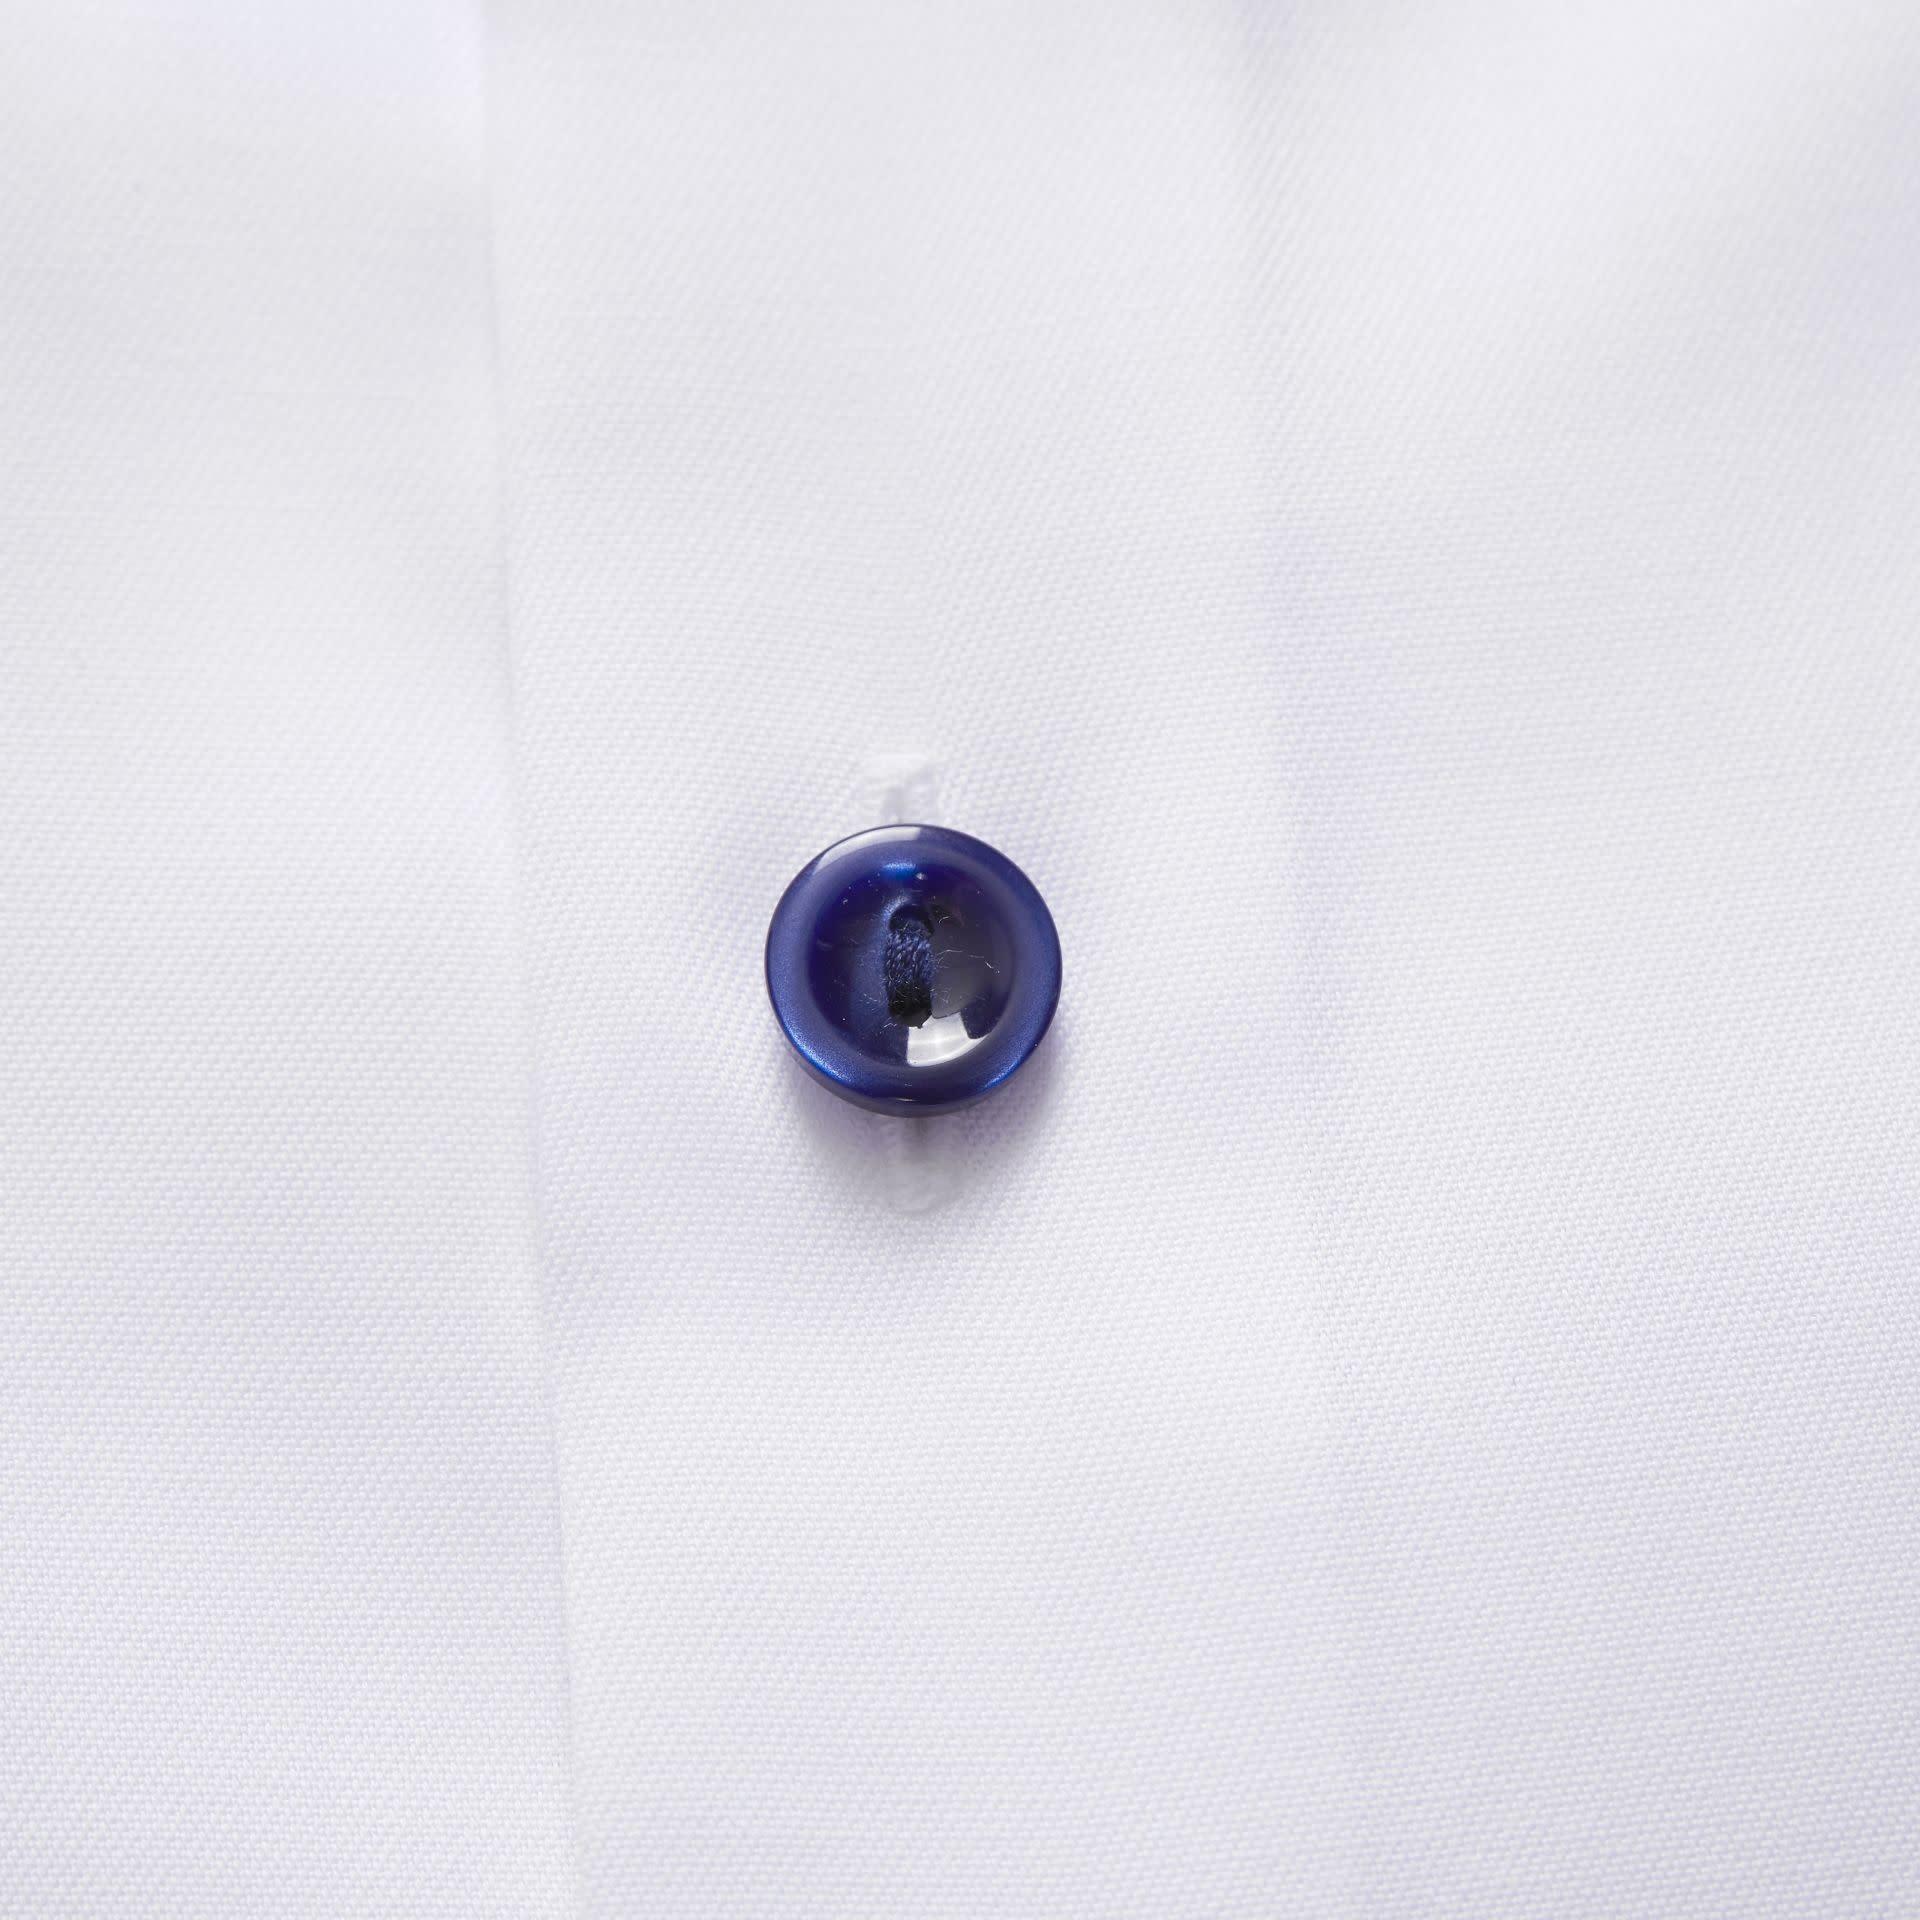 Eton Signature twill with Navy button